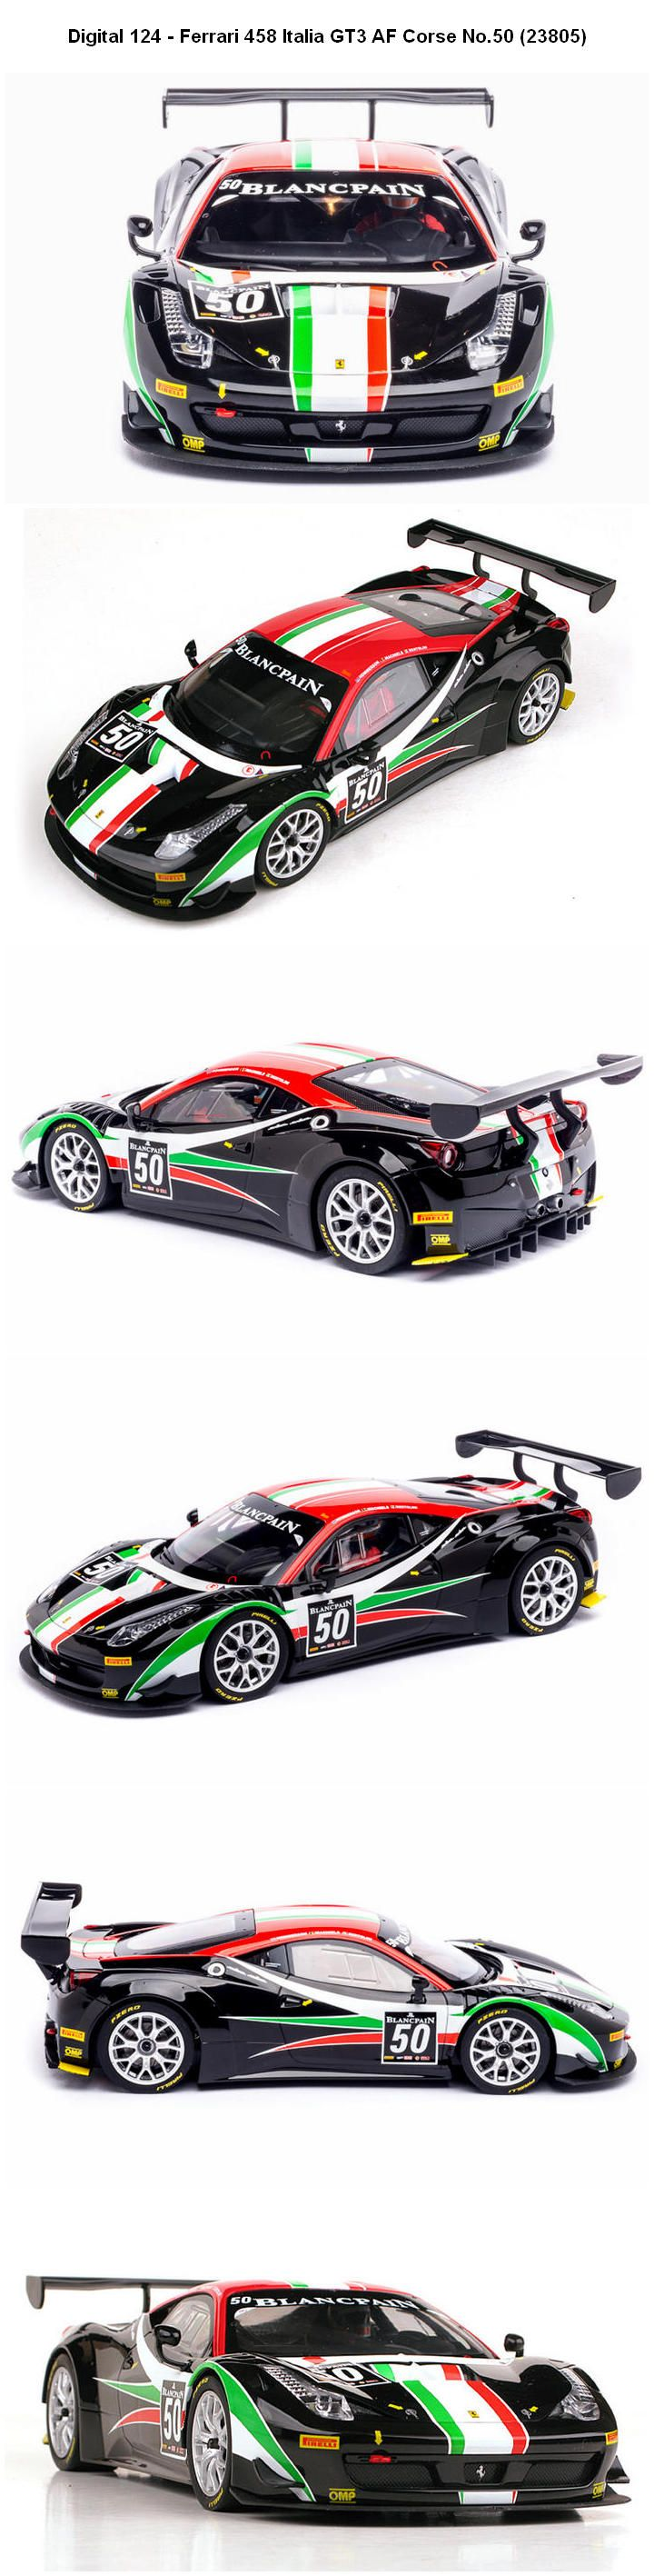 eae19a196da05c7e290fc7a76058bda0--slot-cars-race-cars Fascinating Porsche 911 Gt1 Evo 98 Slot It Cars Trend